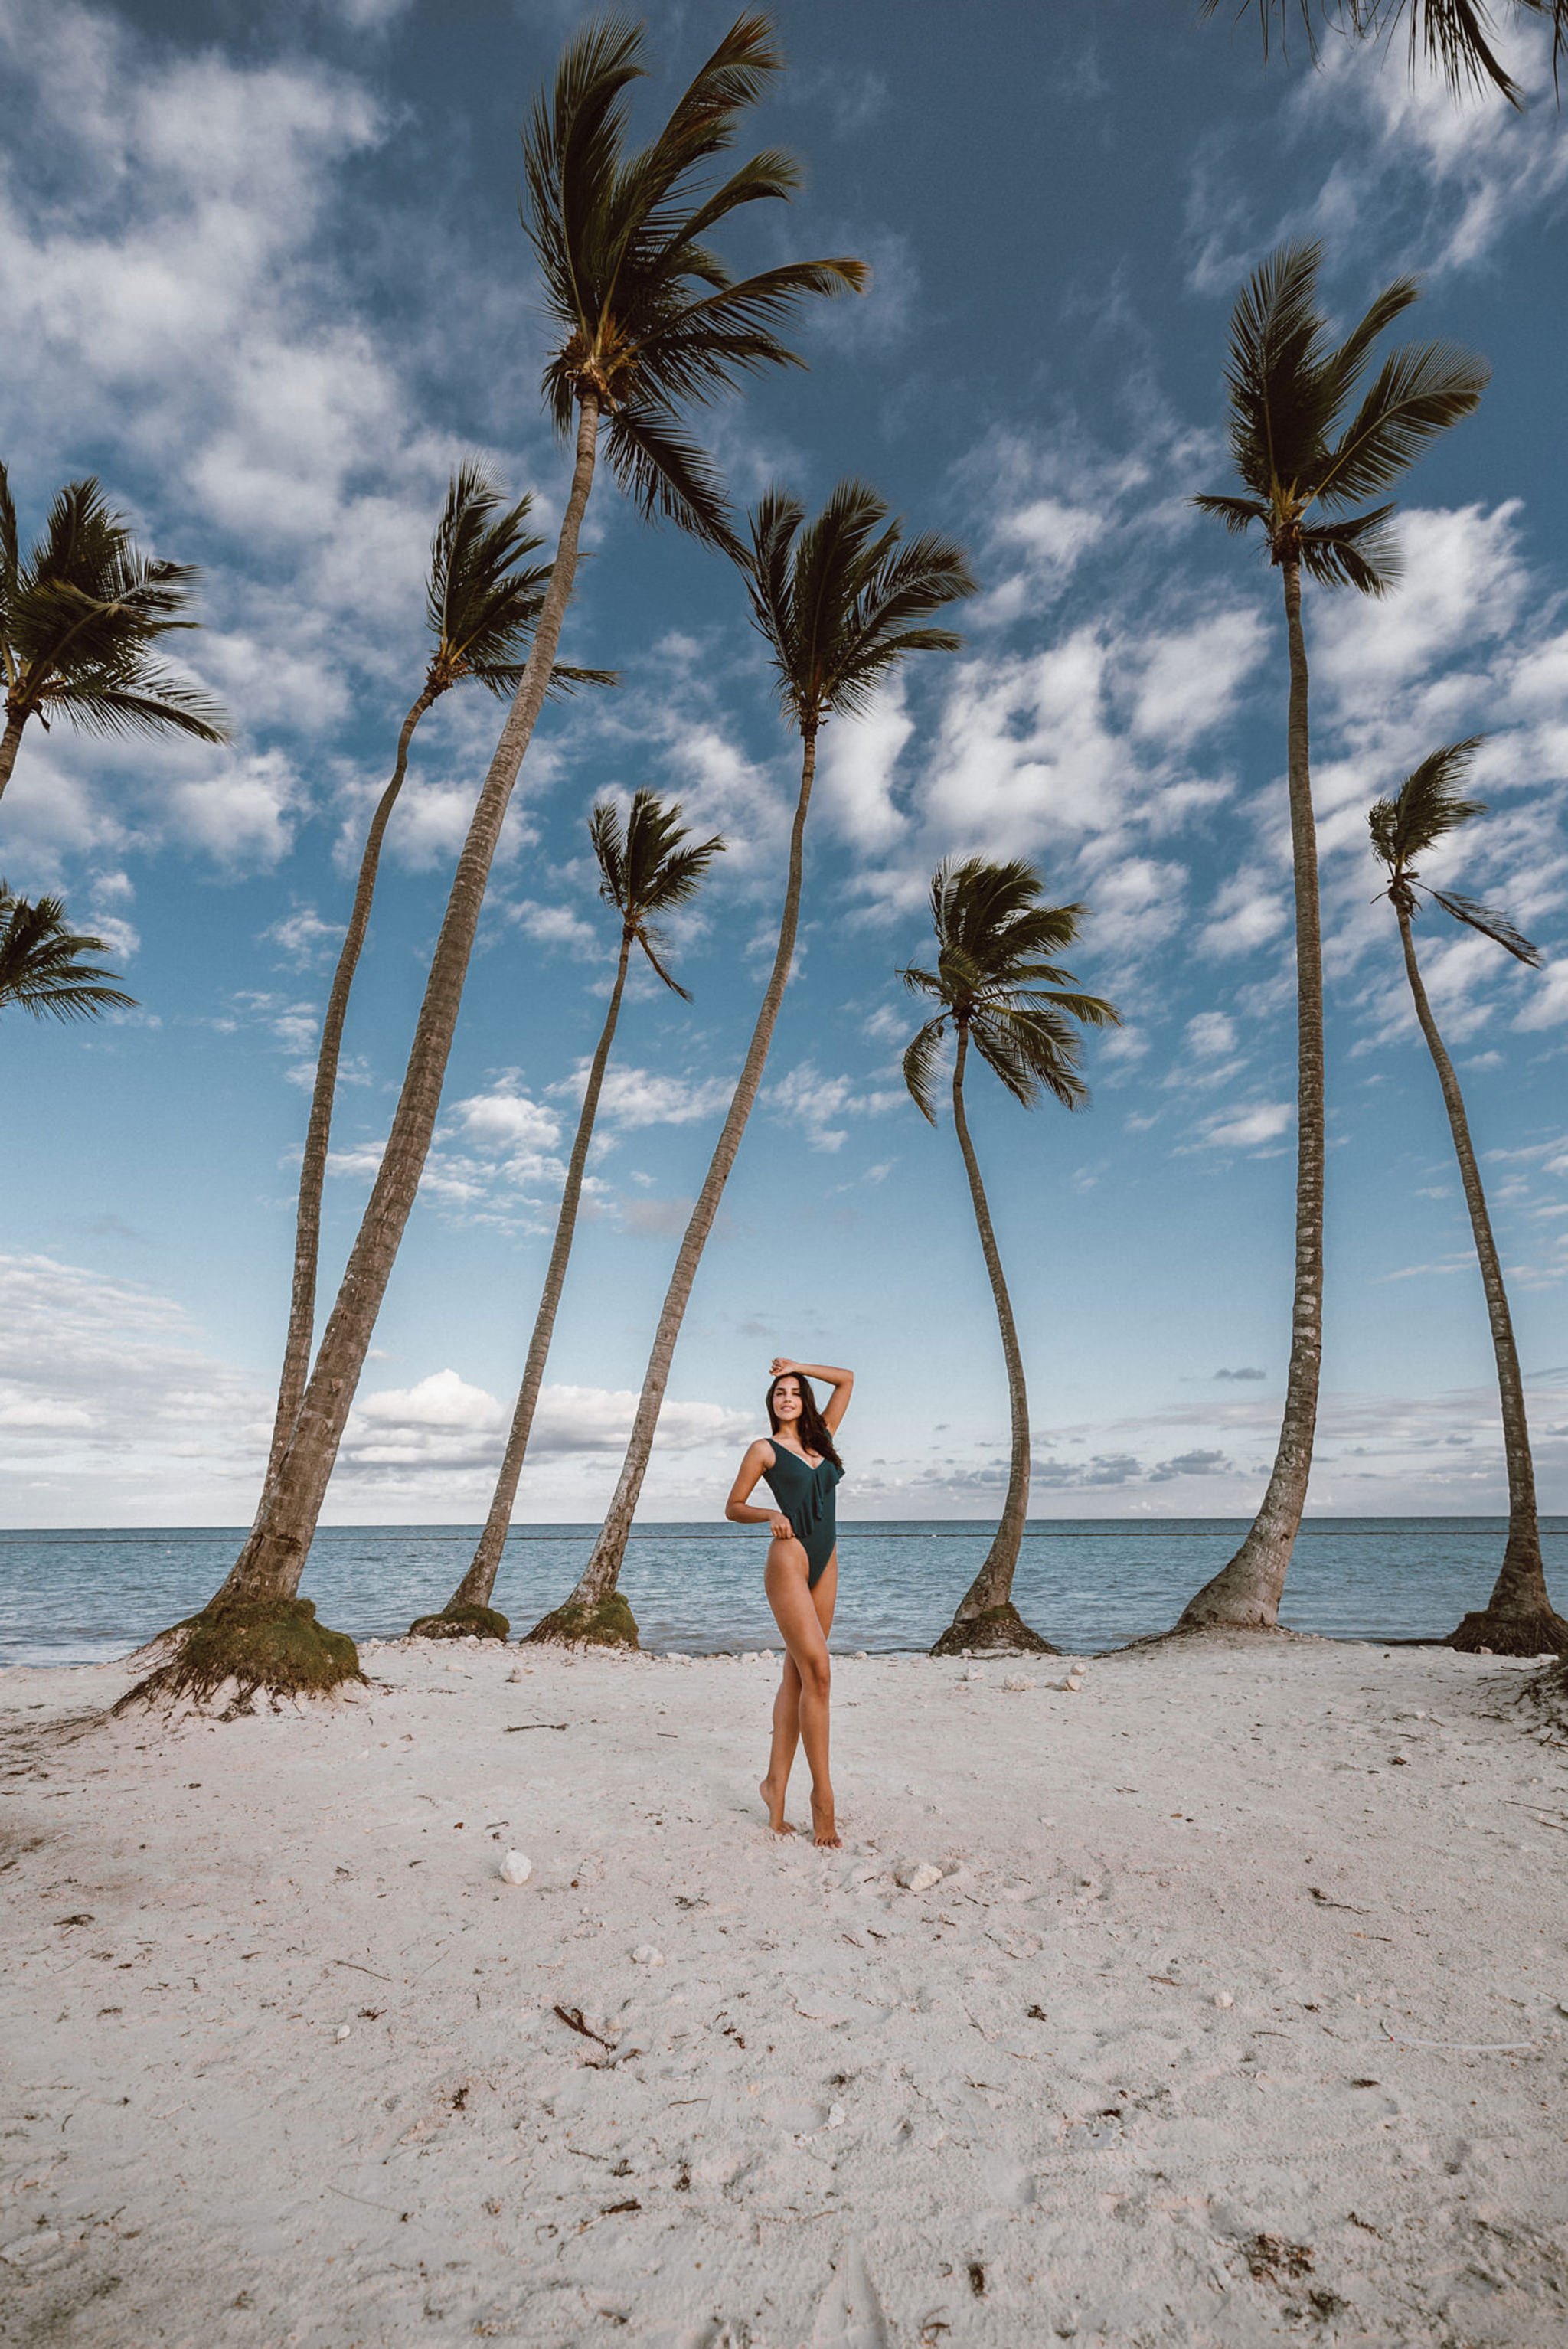 Laura Barjum Republica Dominicana Travel Photography Luis Prince